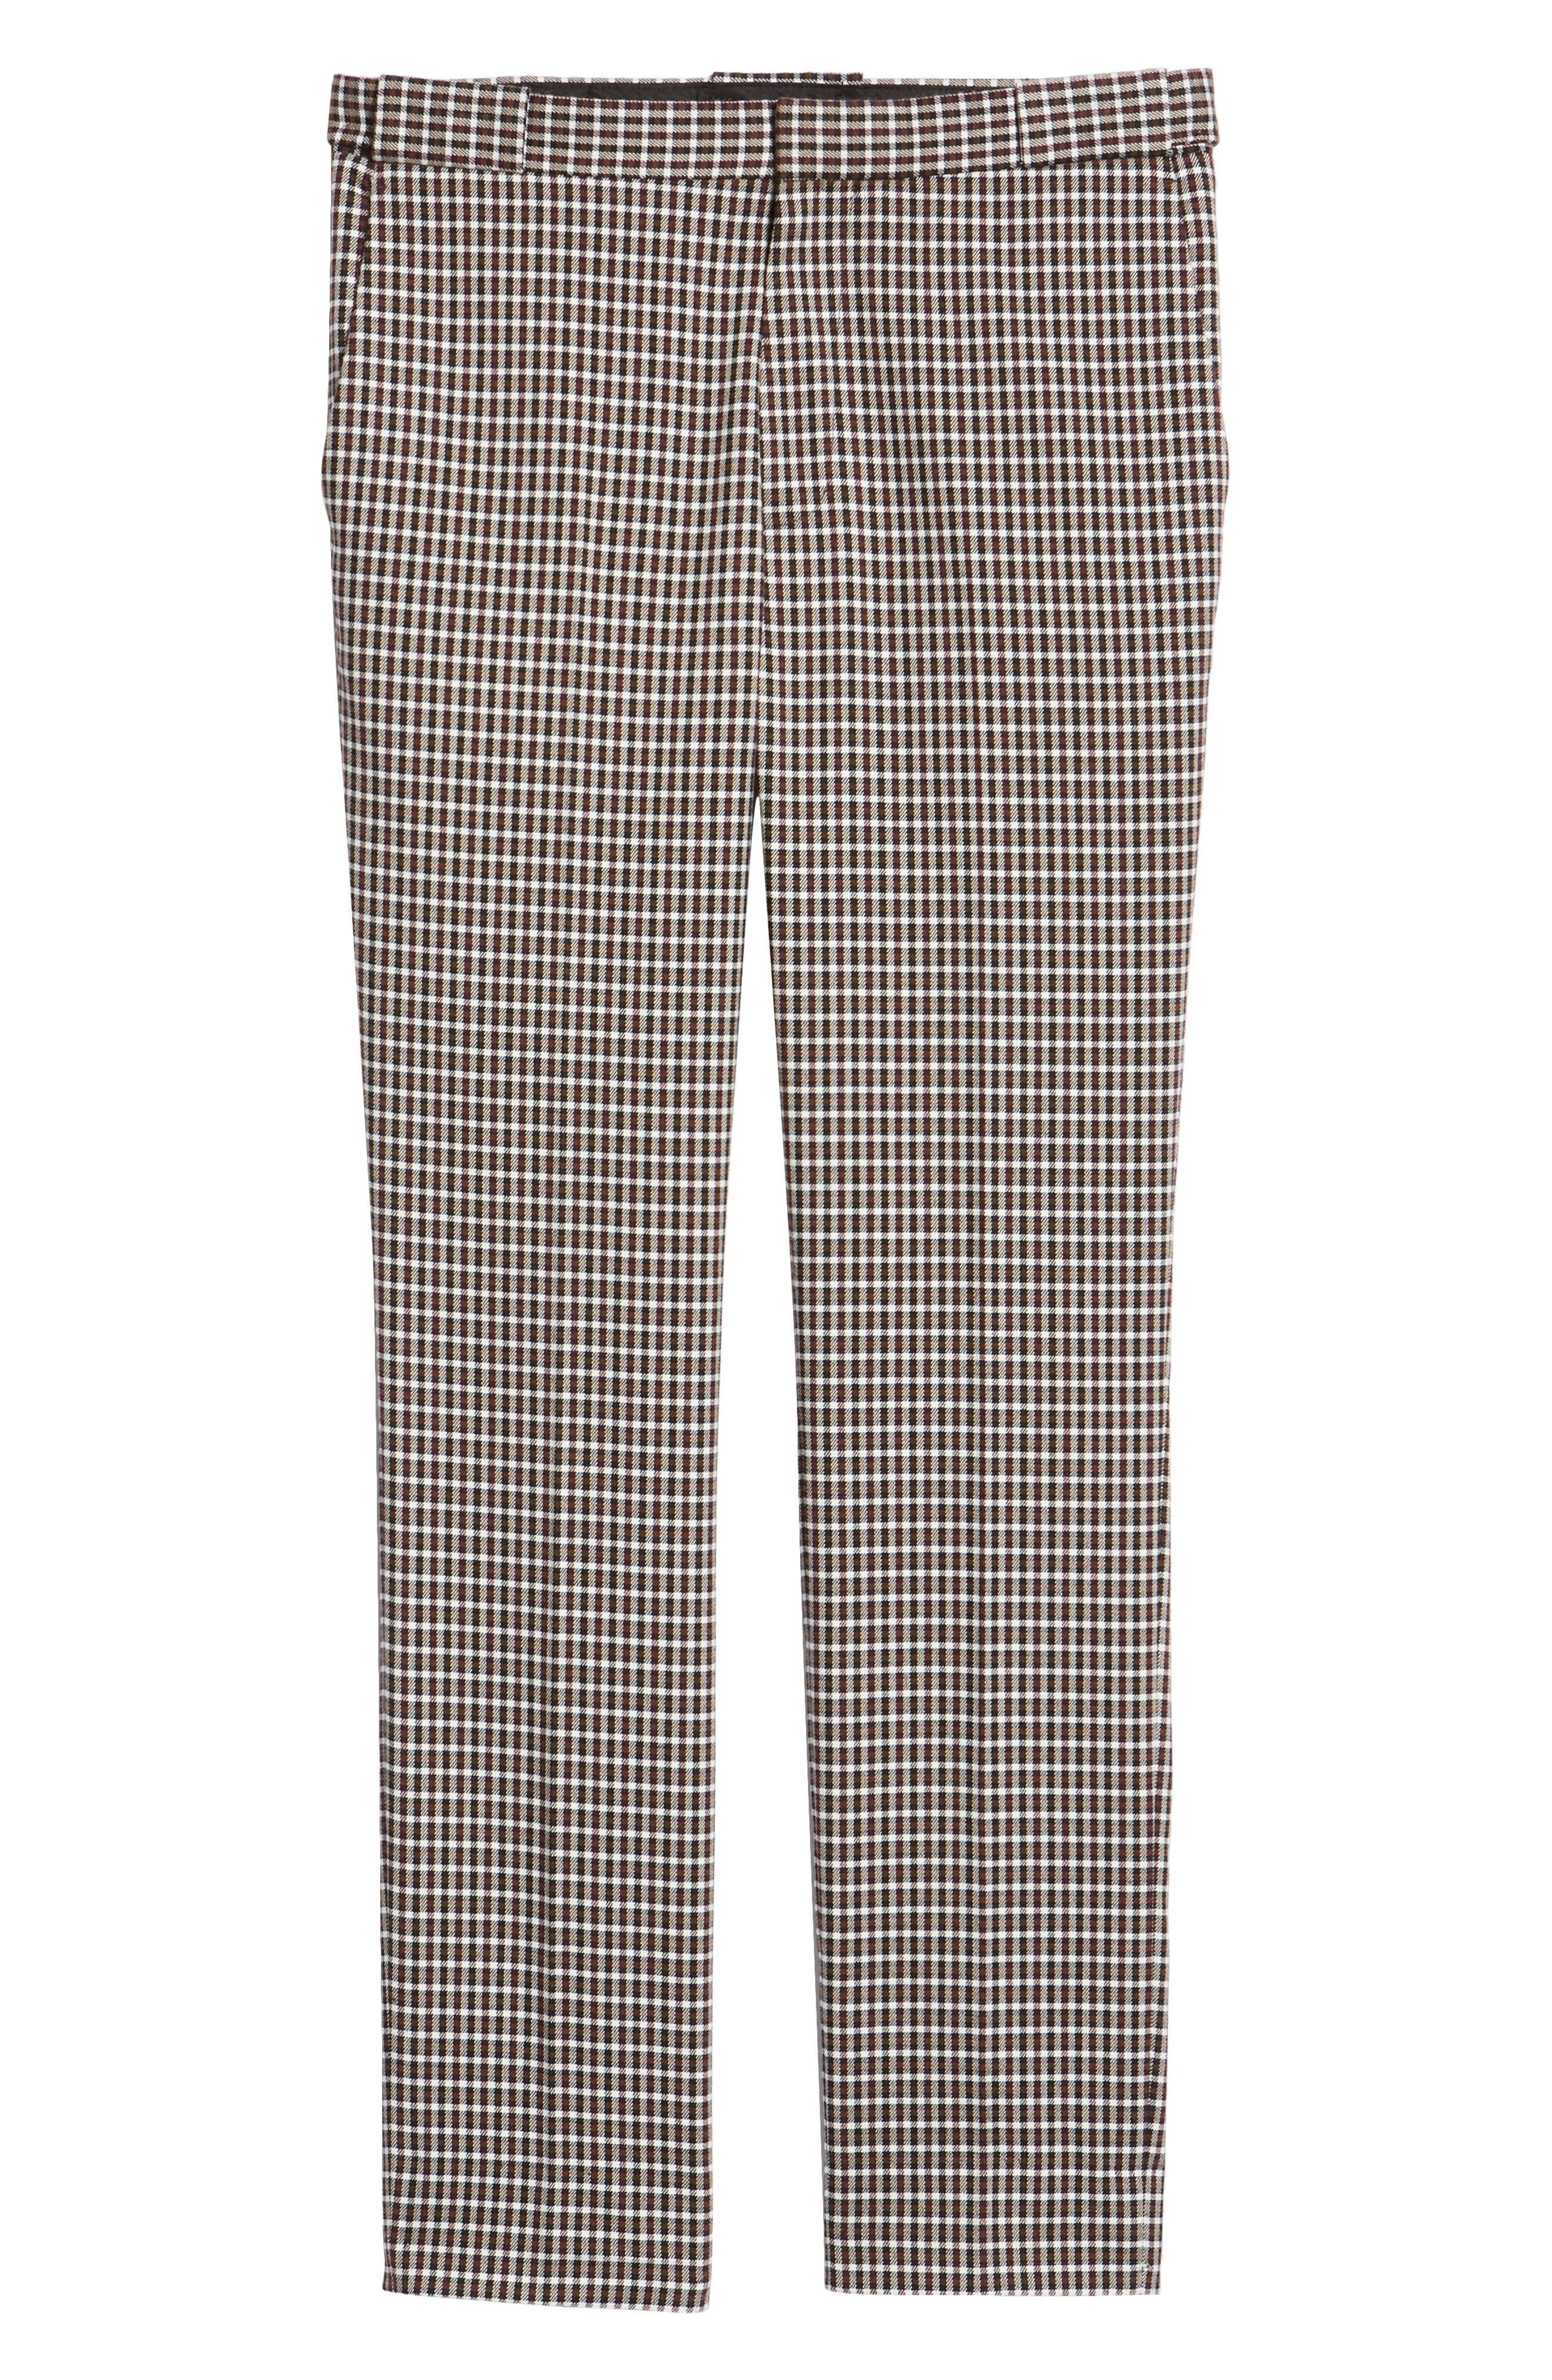 TOPMAN, Multicheck Skinny Fit Trousers, Alternate thumbnail 6, color, BLACK MULTI